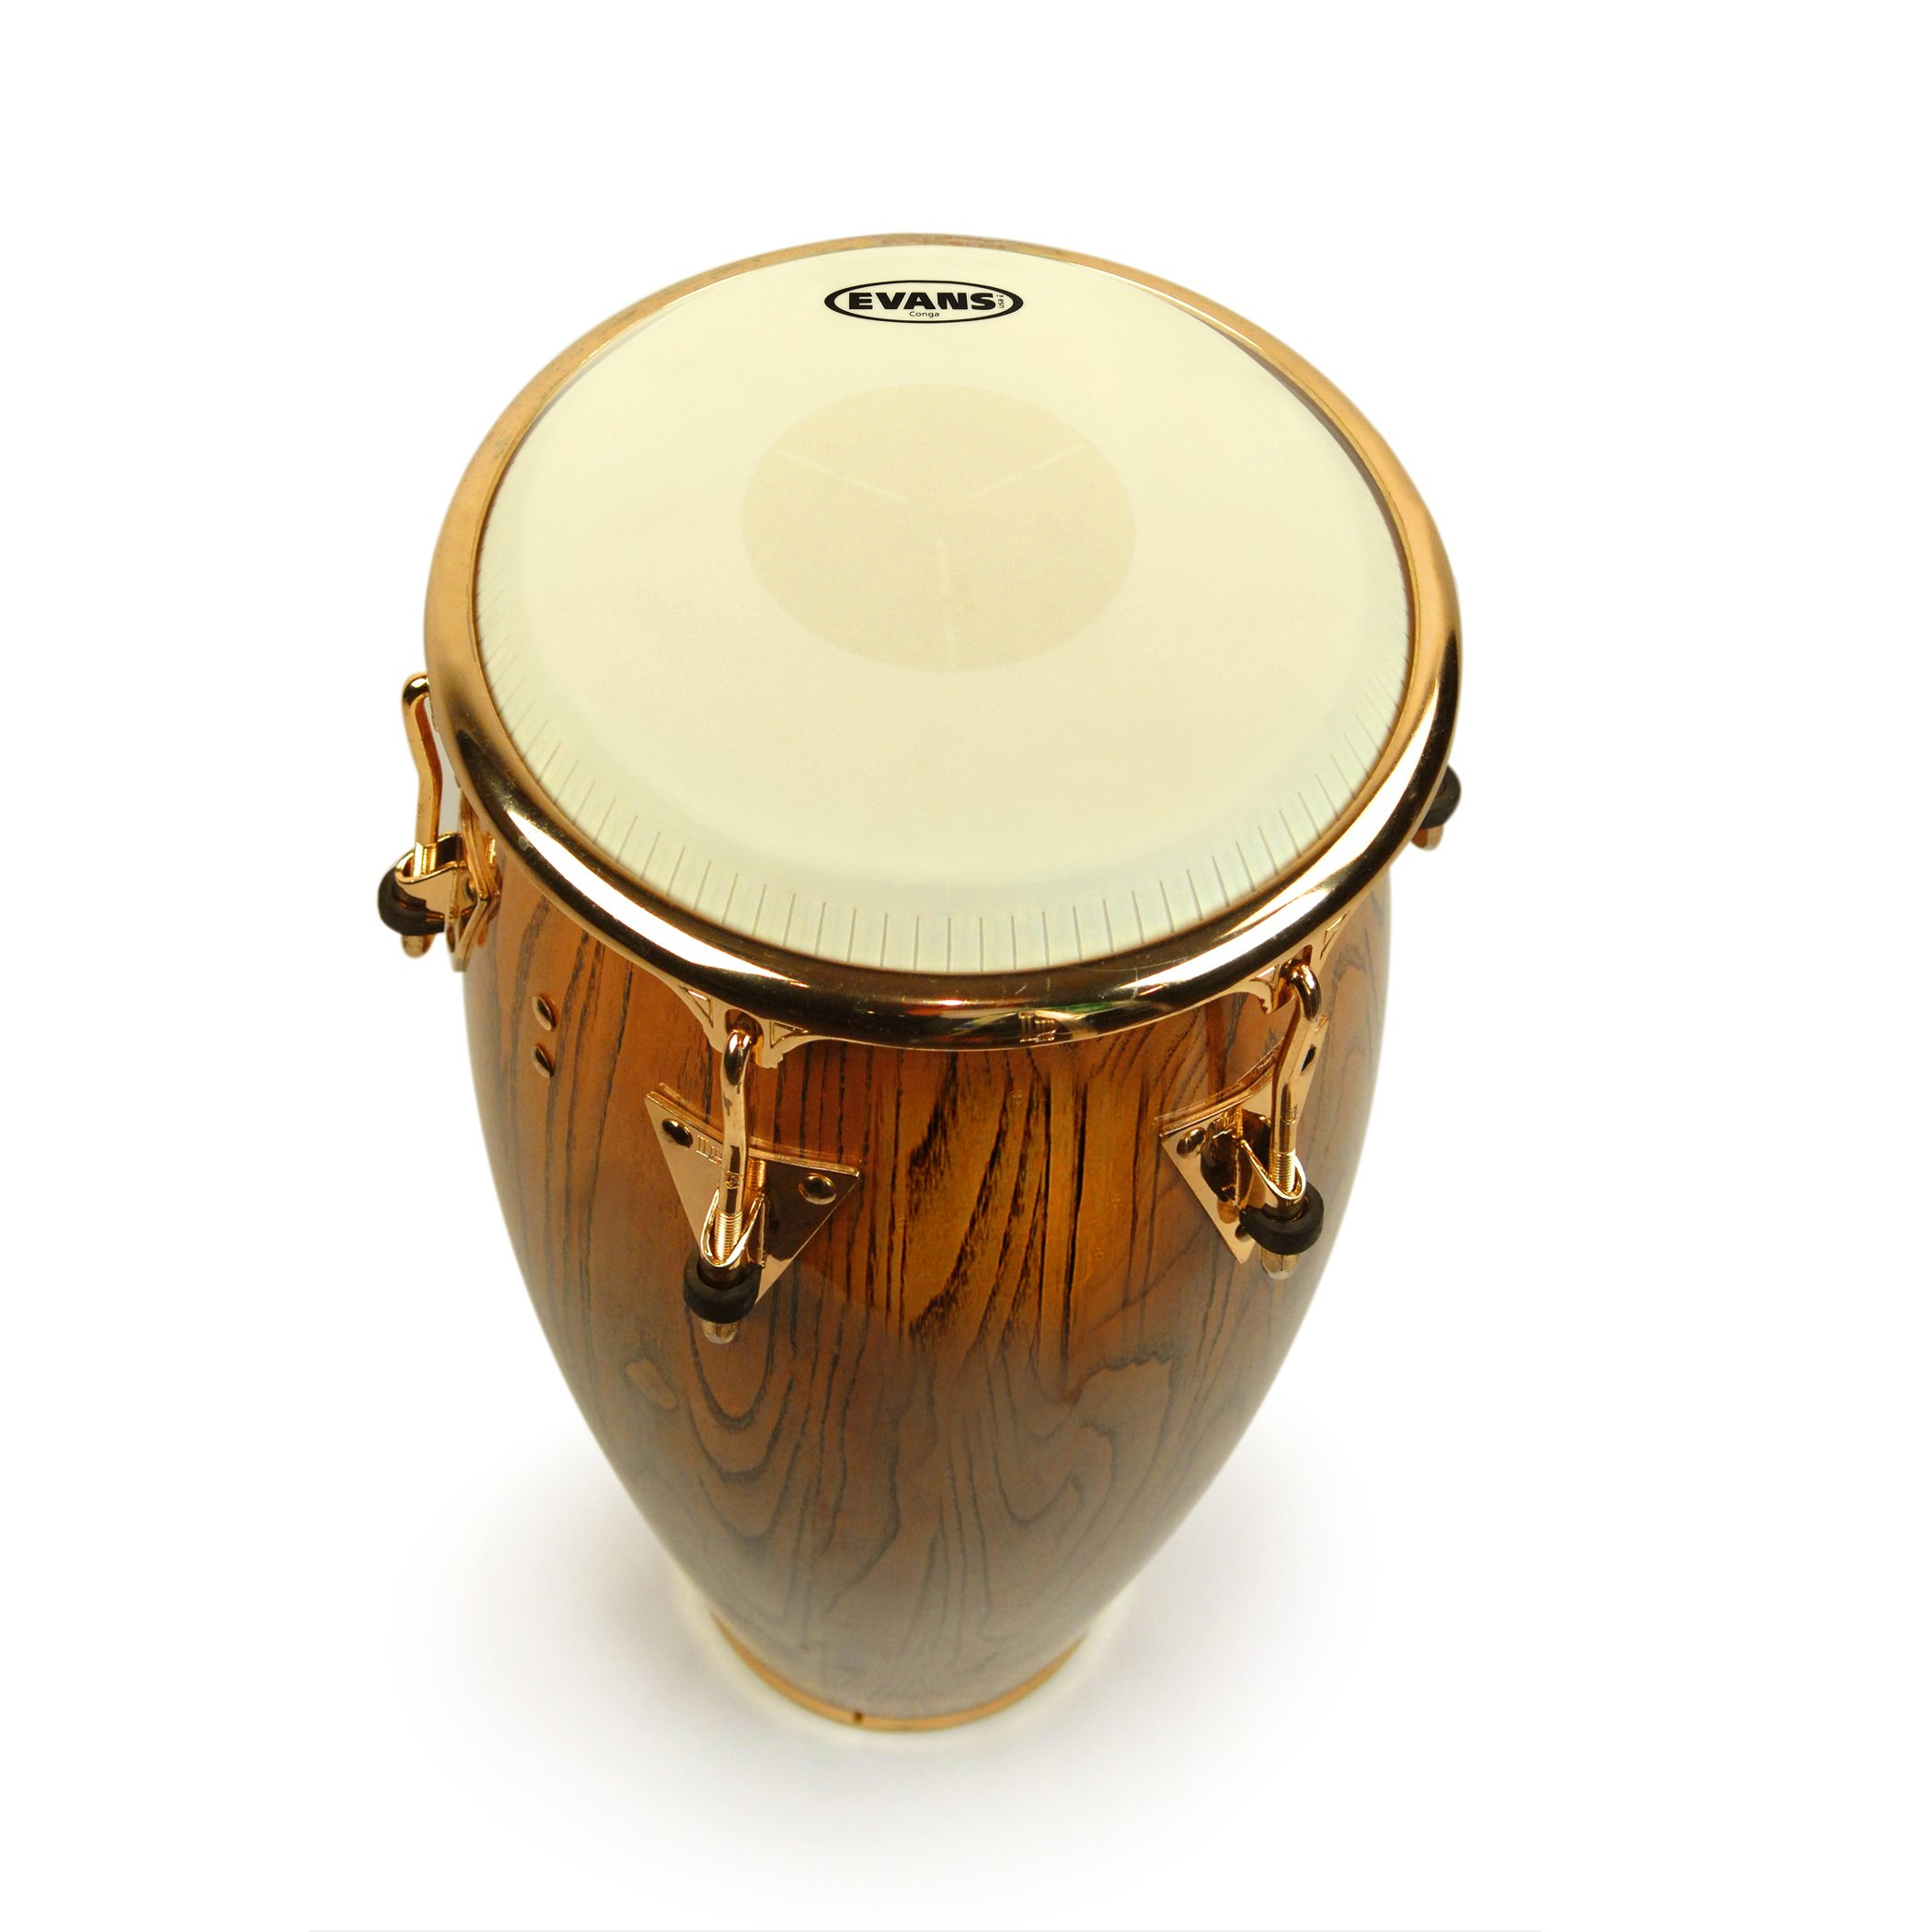 Evans Tri-Center Conga Drum Head, 11.00 Inch by Evans